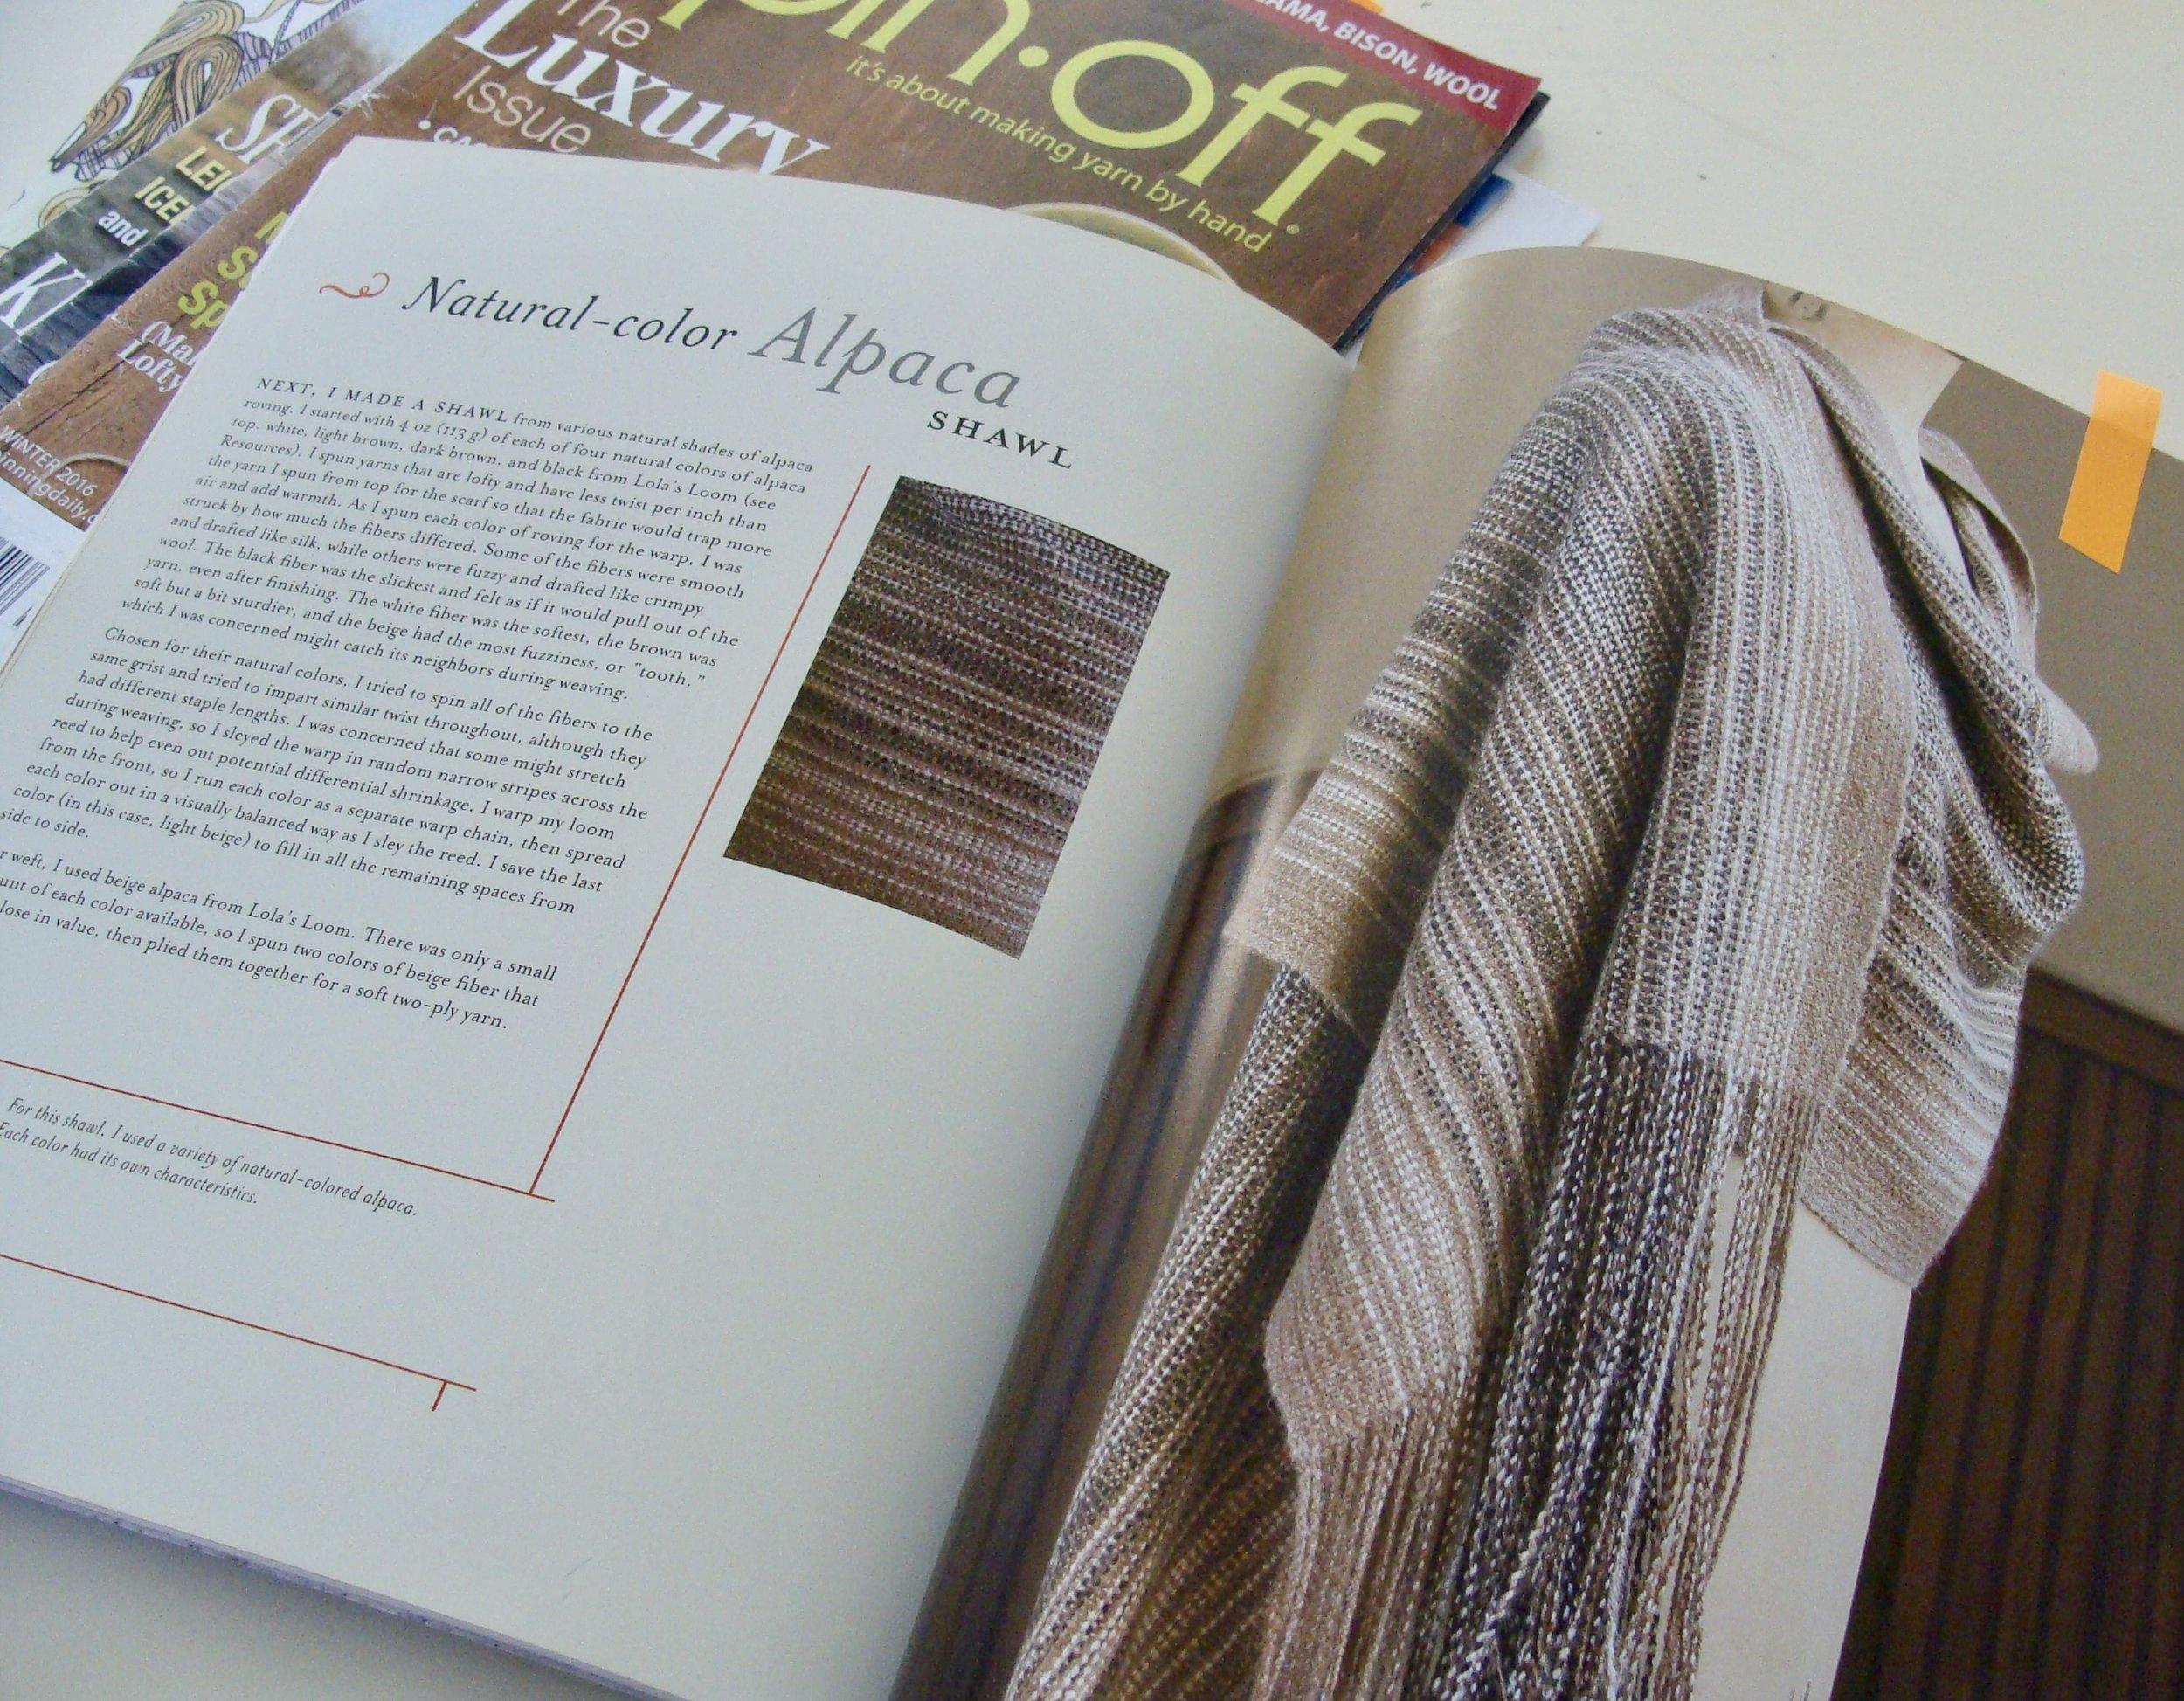 Planned hand-spun, handwoven alpaca shawl